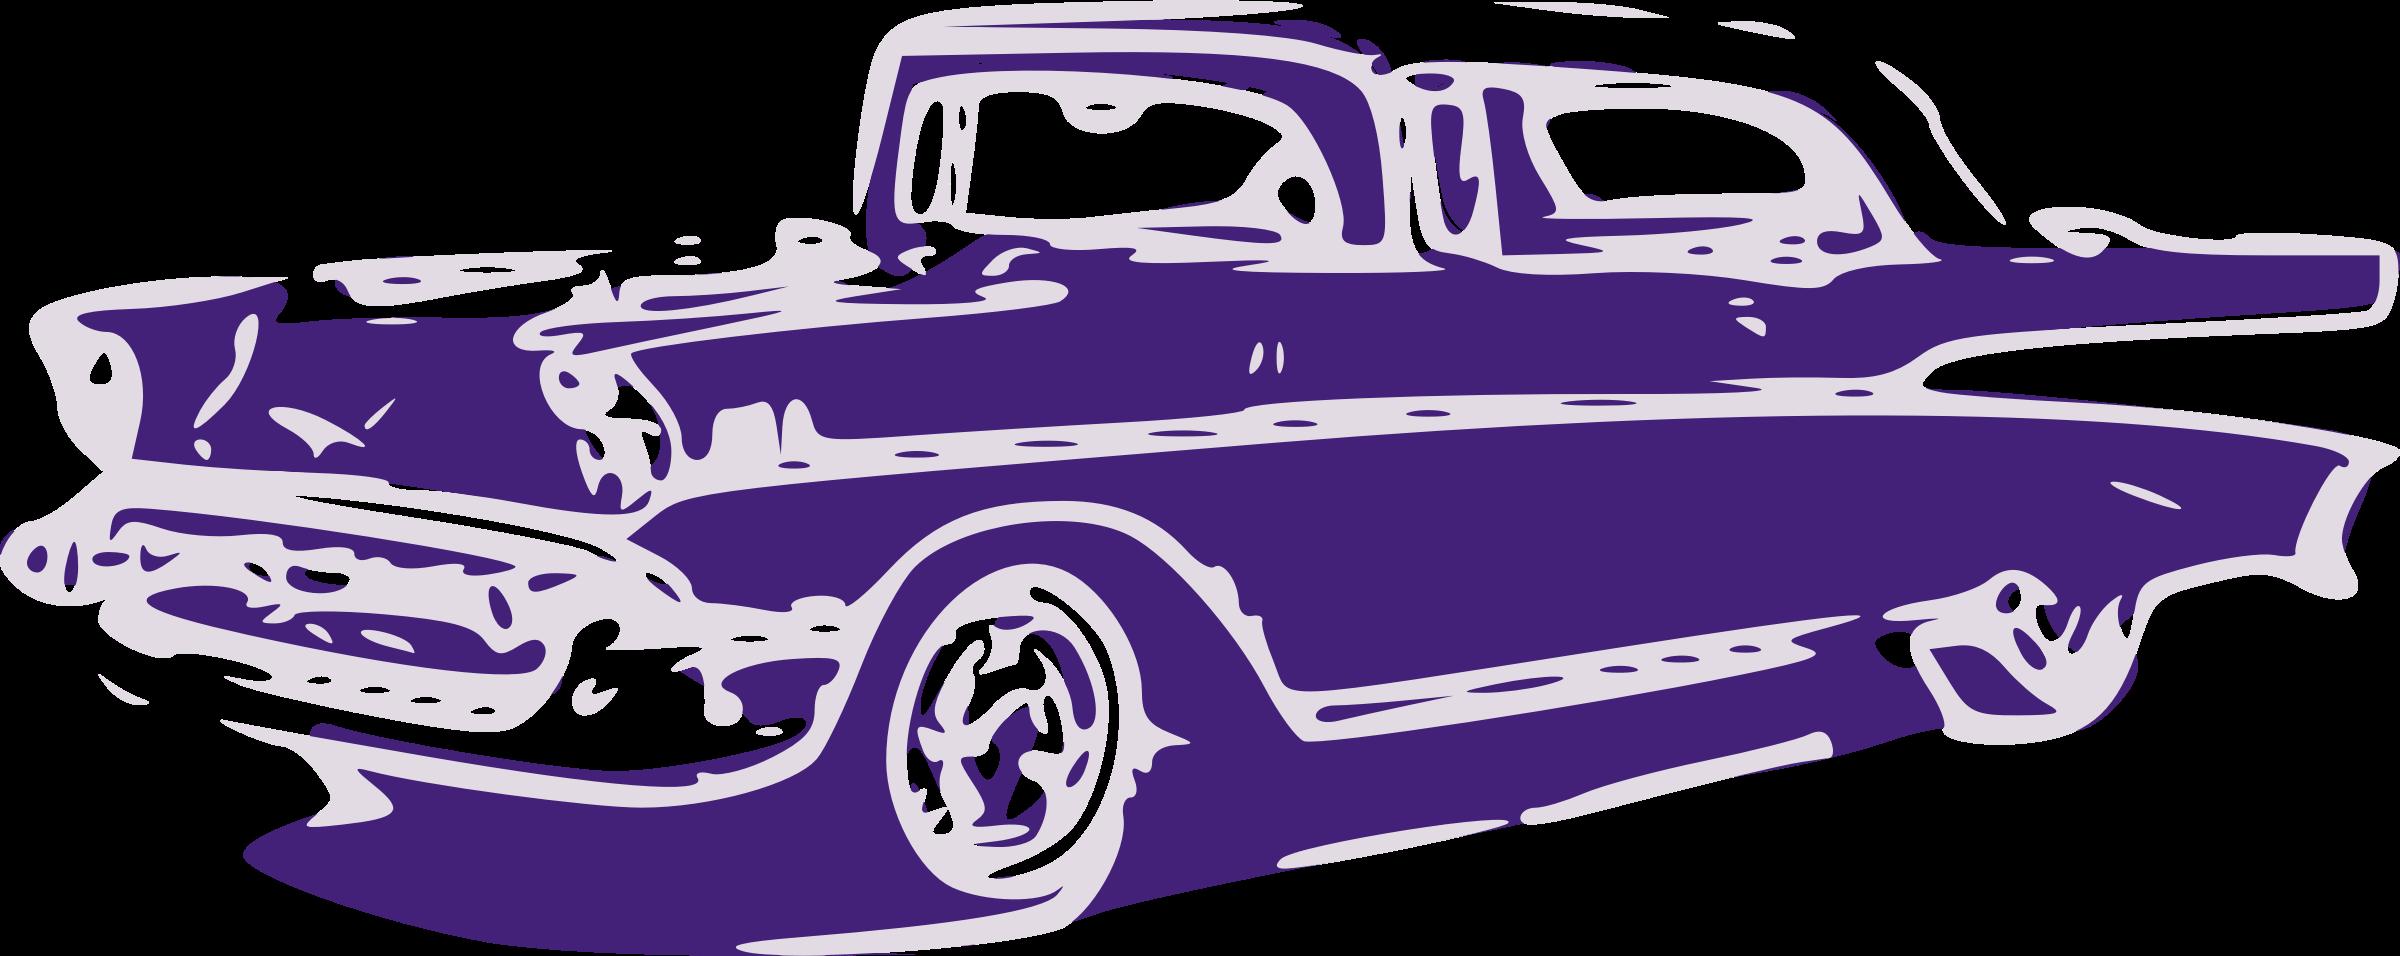 Car clipart jpg vector free download Classic car clipart - Clipground vector free download